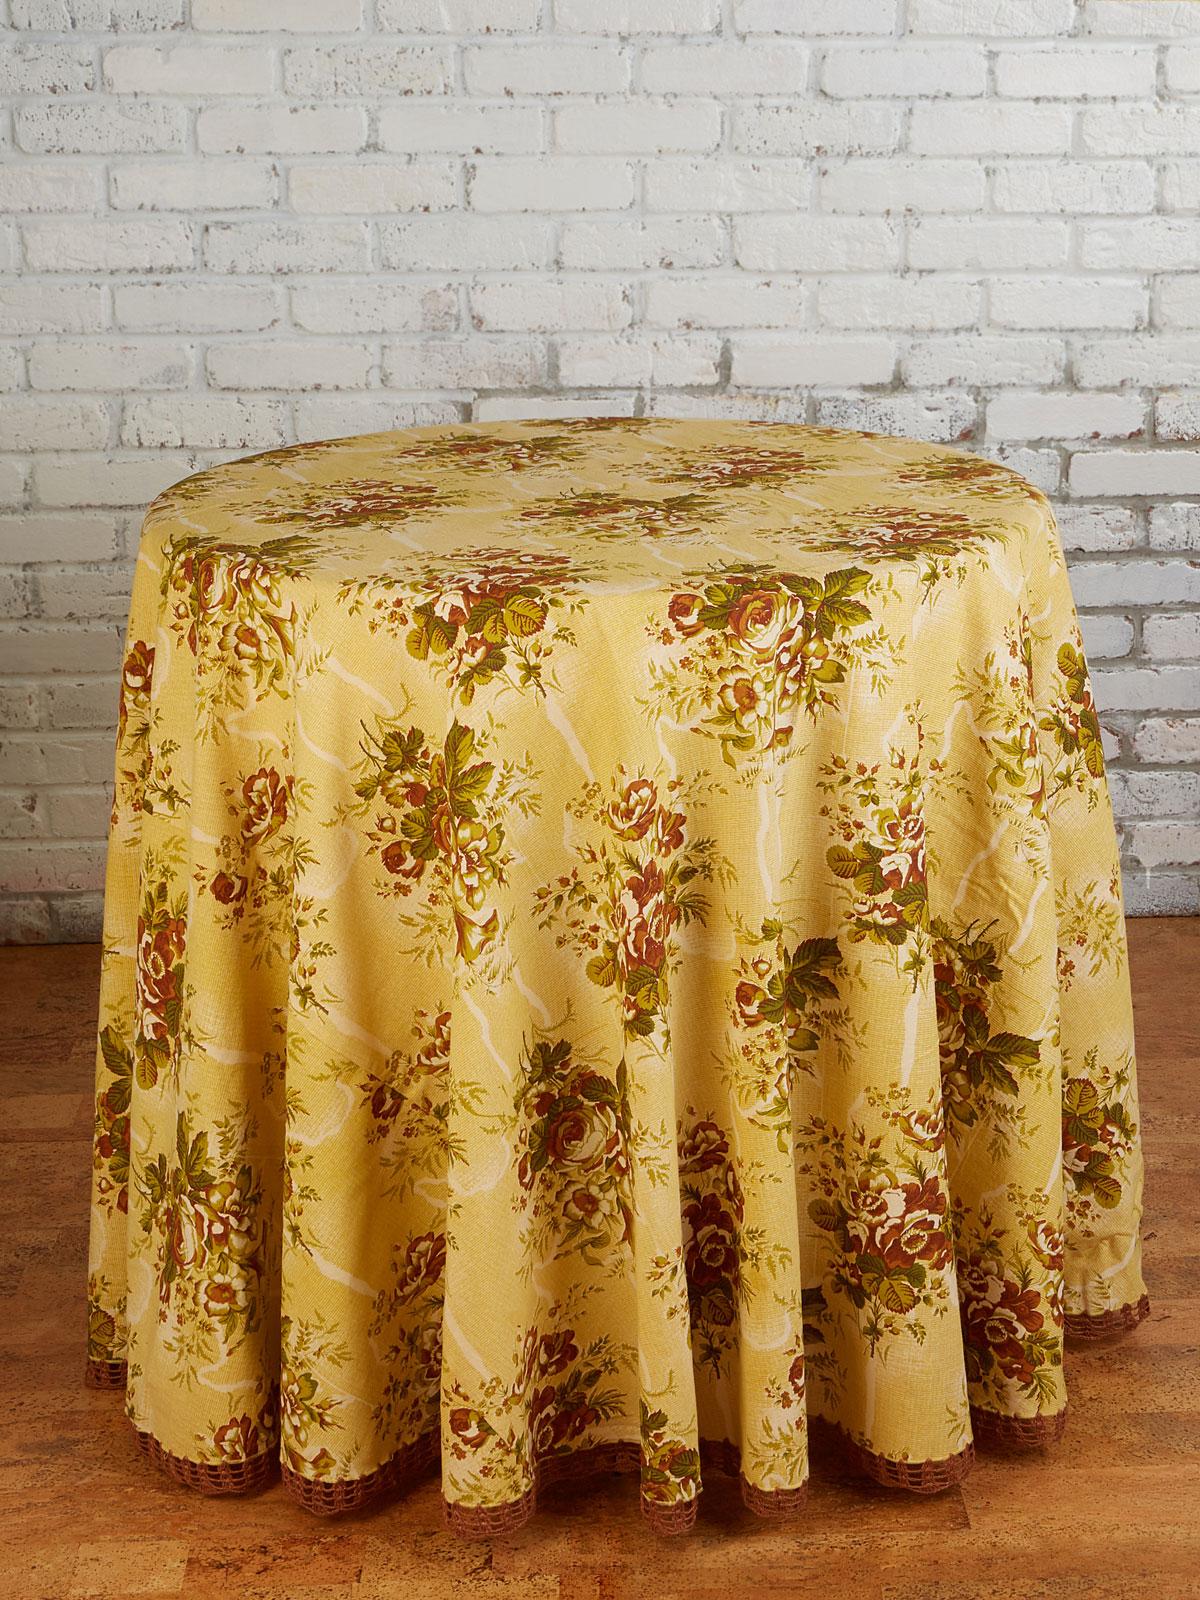 Rosalie Crochet Round Tablecloth Attic Sale Linens Kitchen